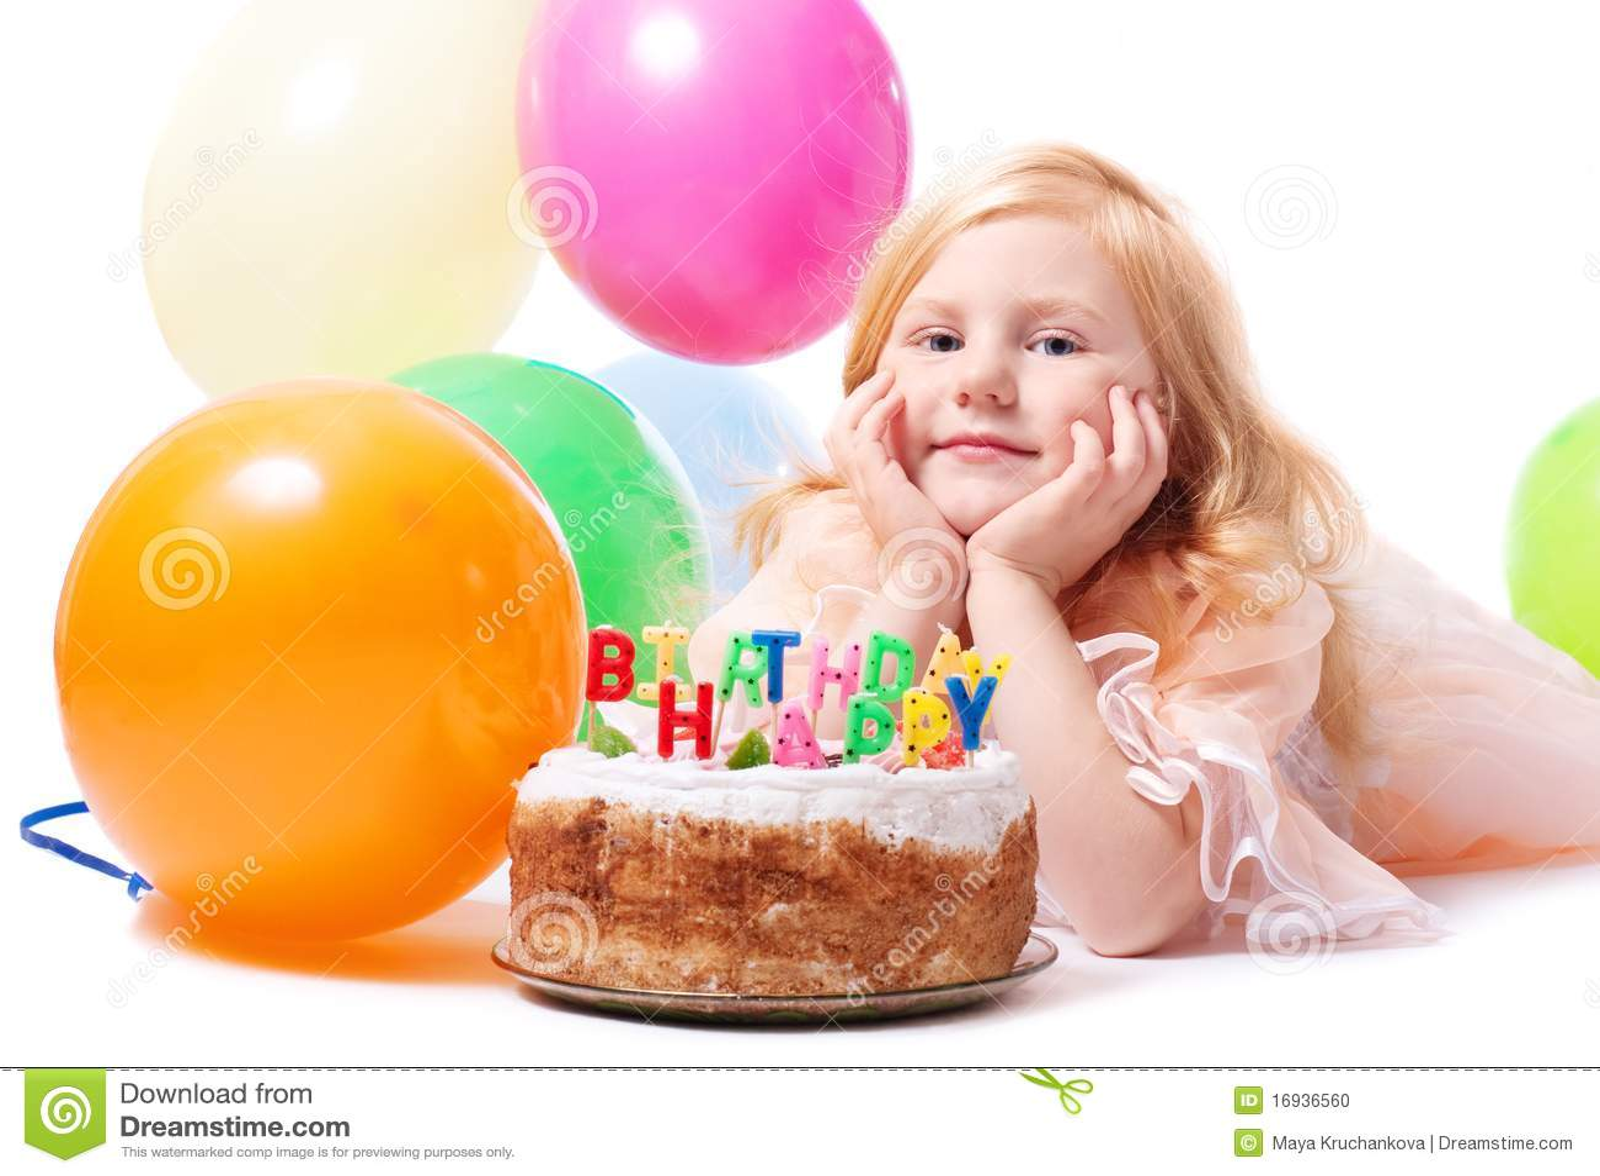 Little girl with birthday cake